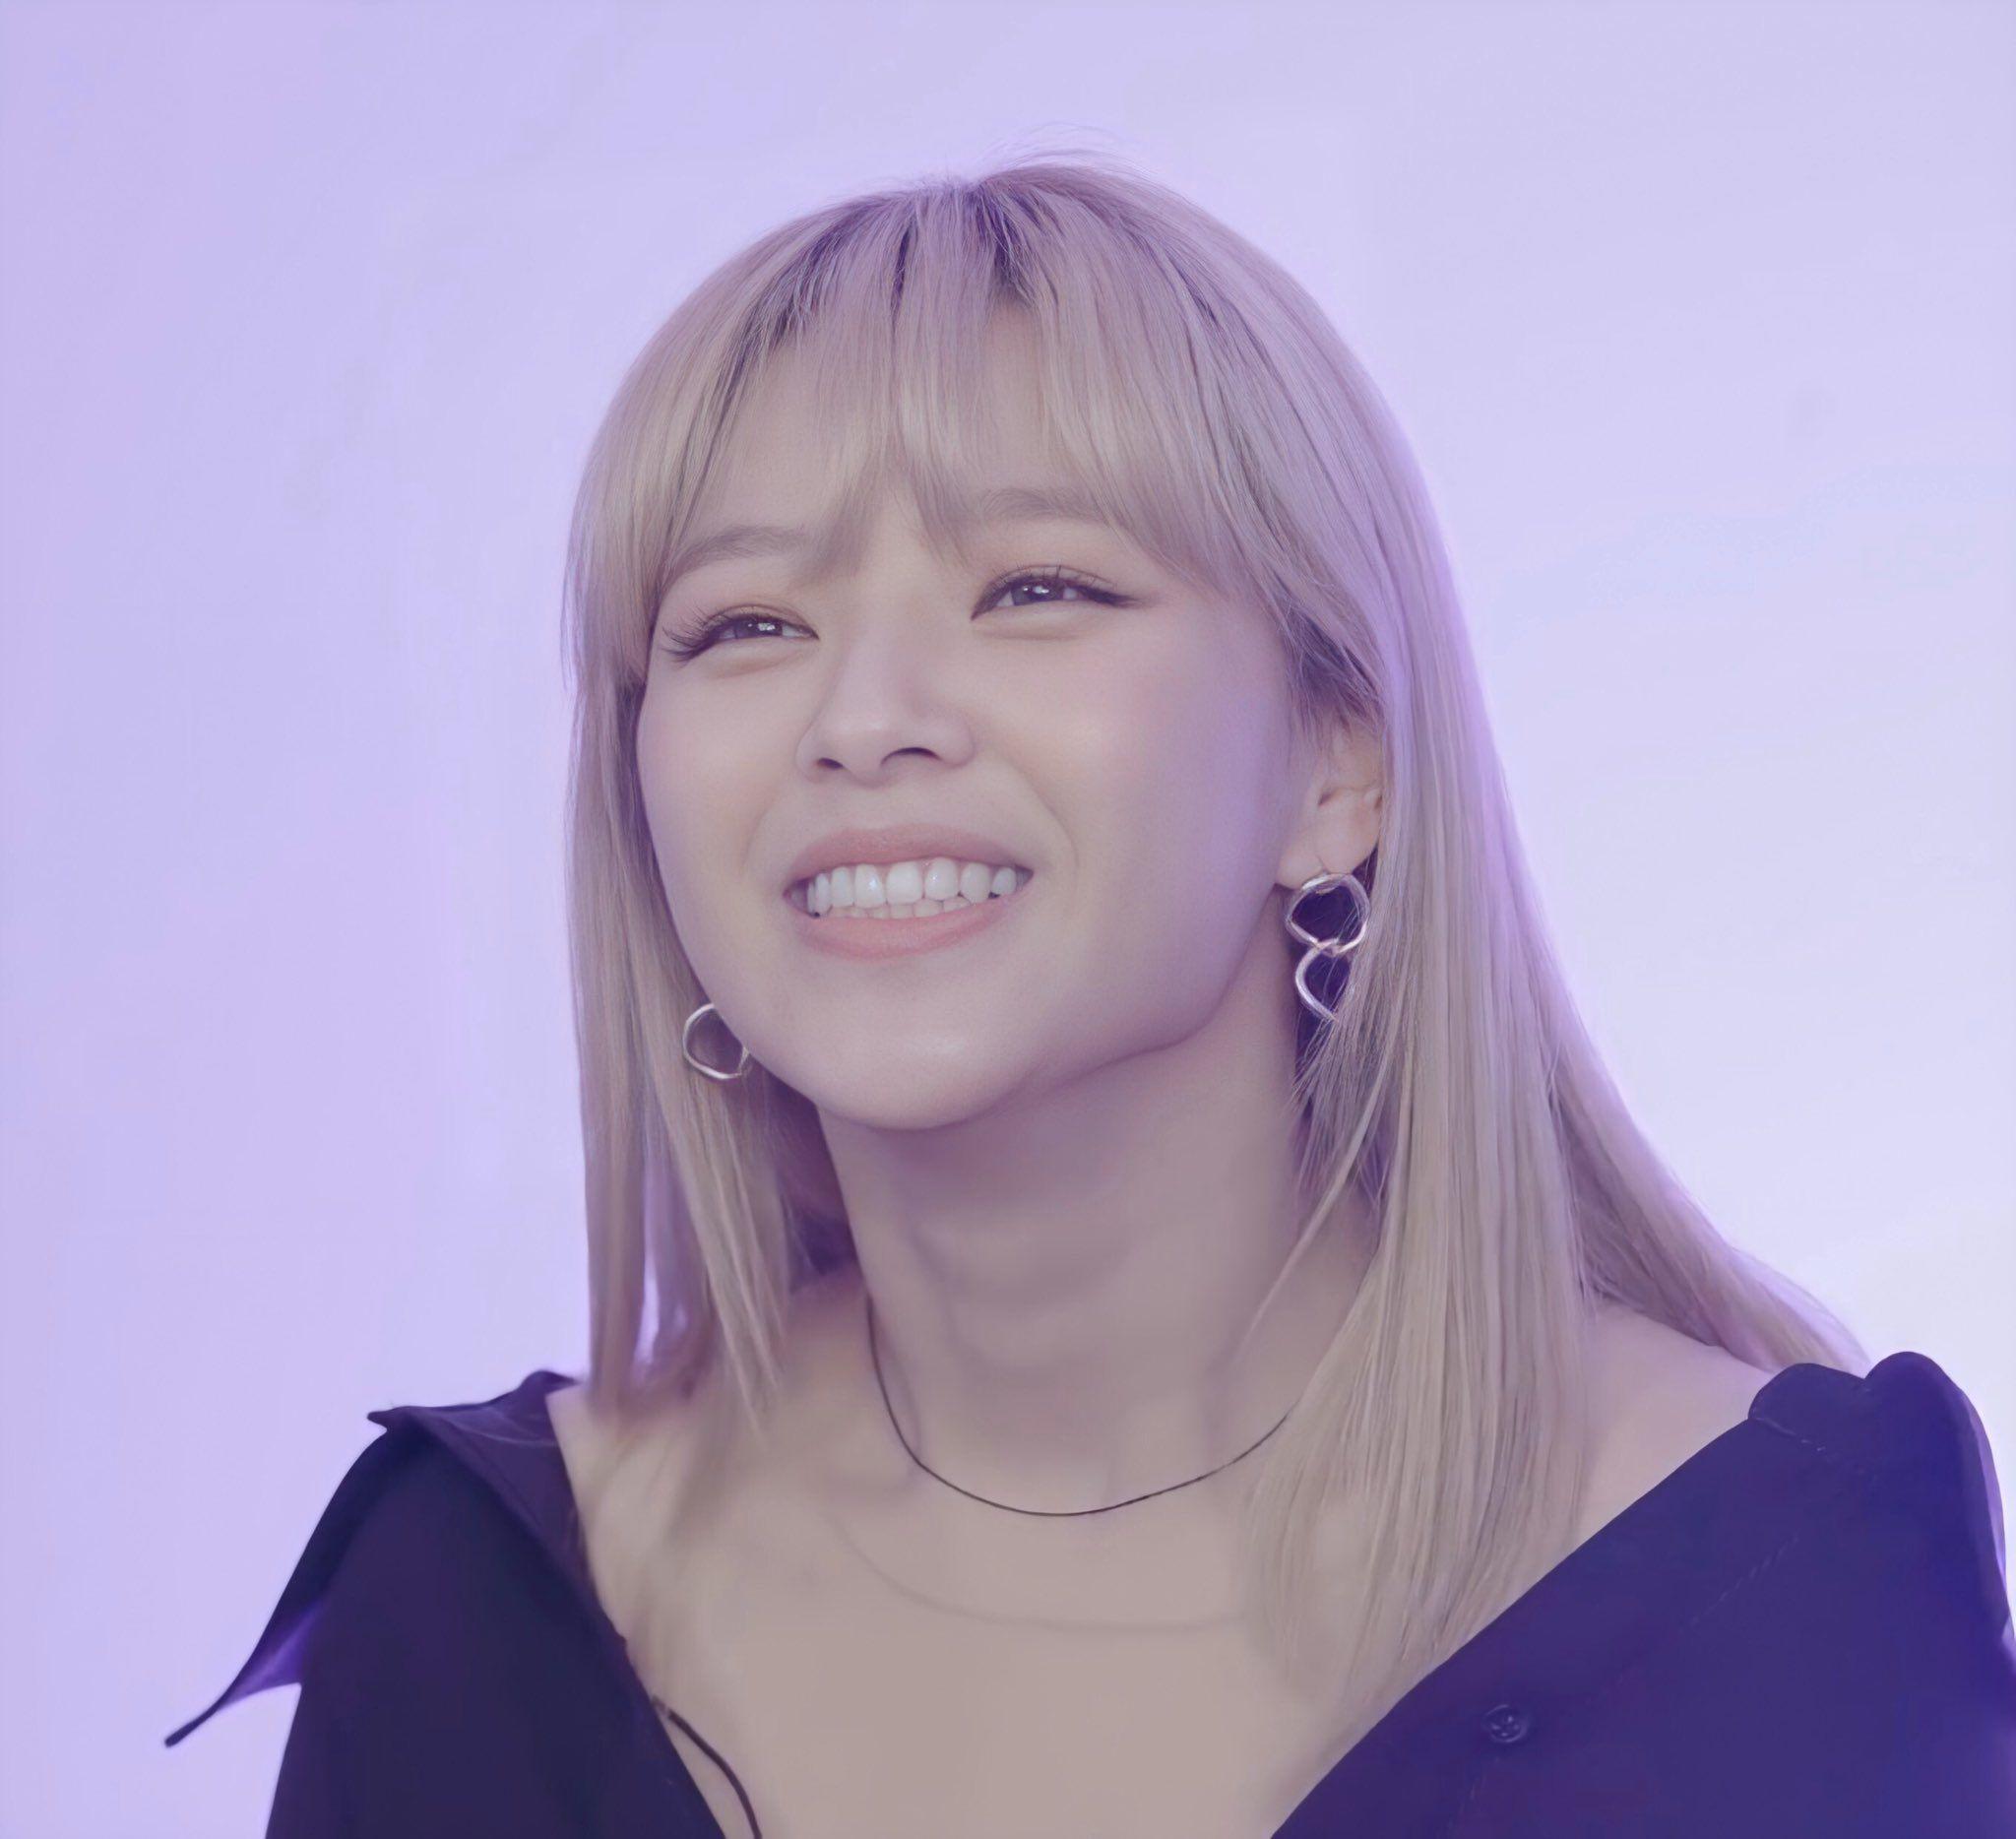 jeongyeon pics on Twitter